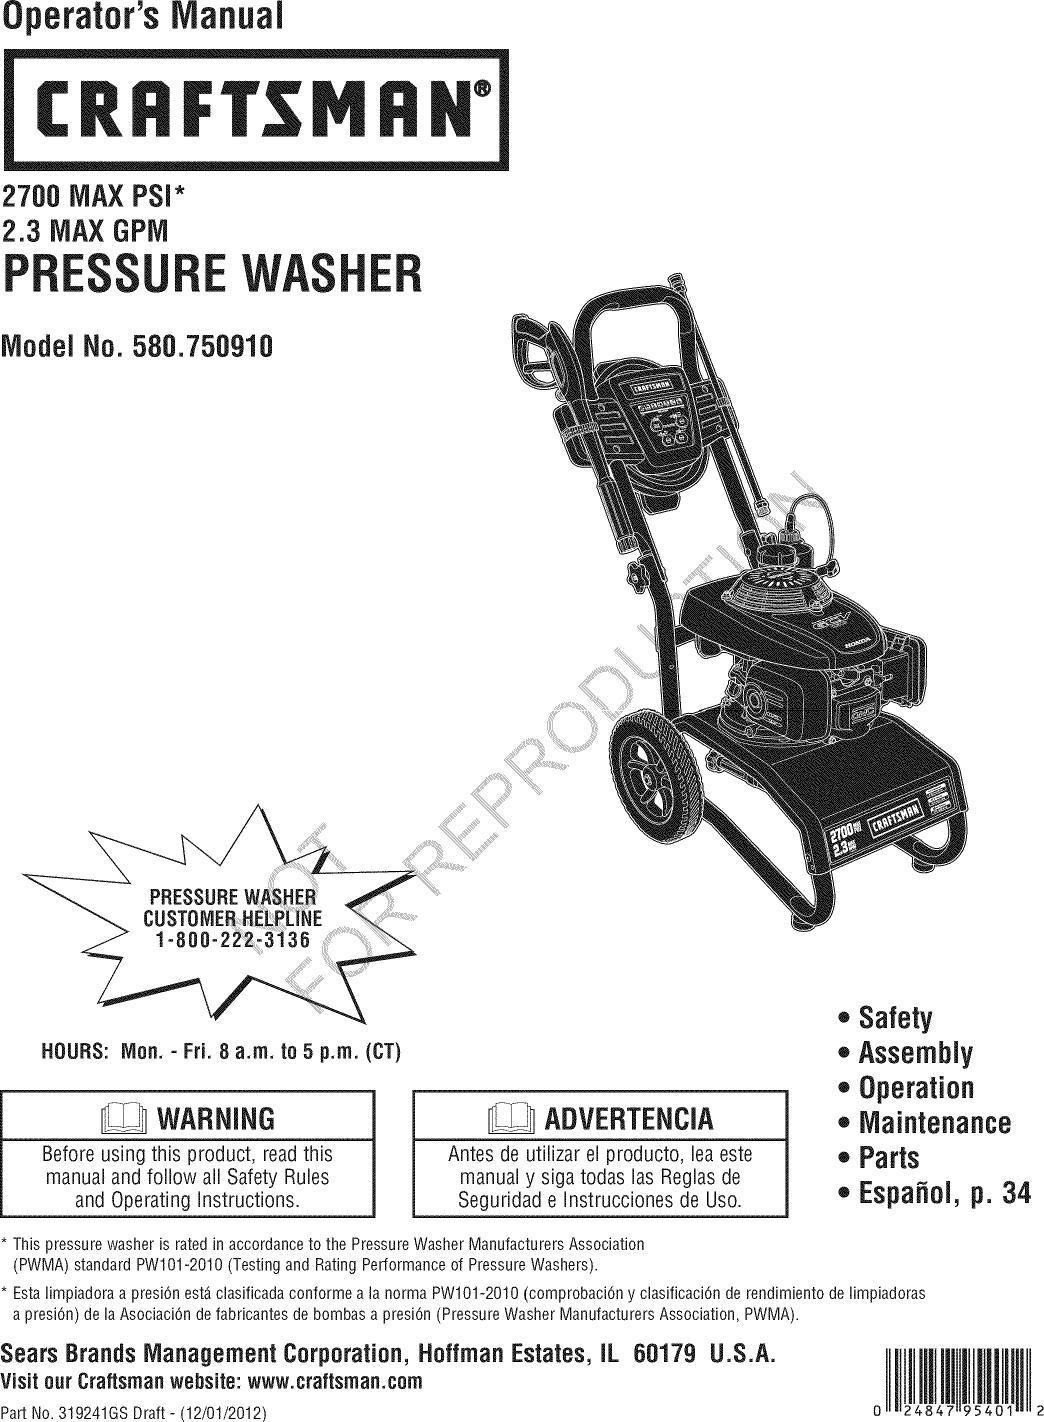 craftsman 580750910 1212173l user manual pressure washer manuals and